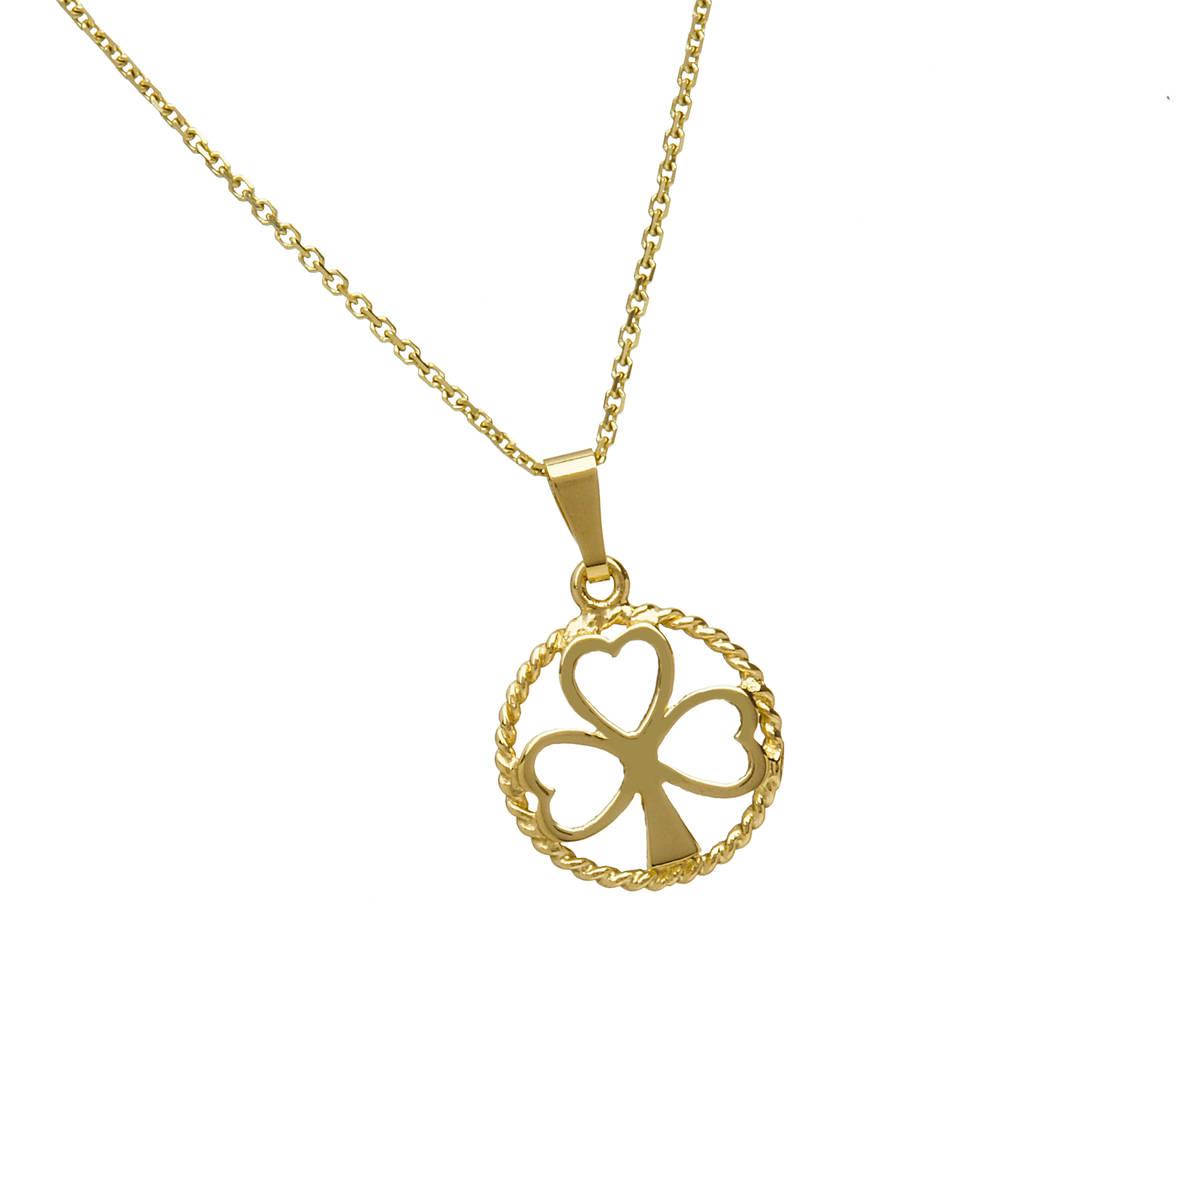 "10 carat yellow gold open shamrock in circleon 18\"" chain pendant."